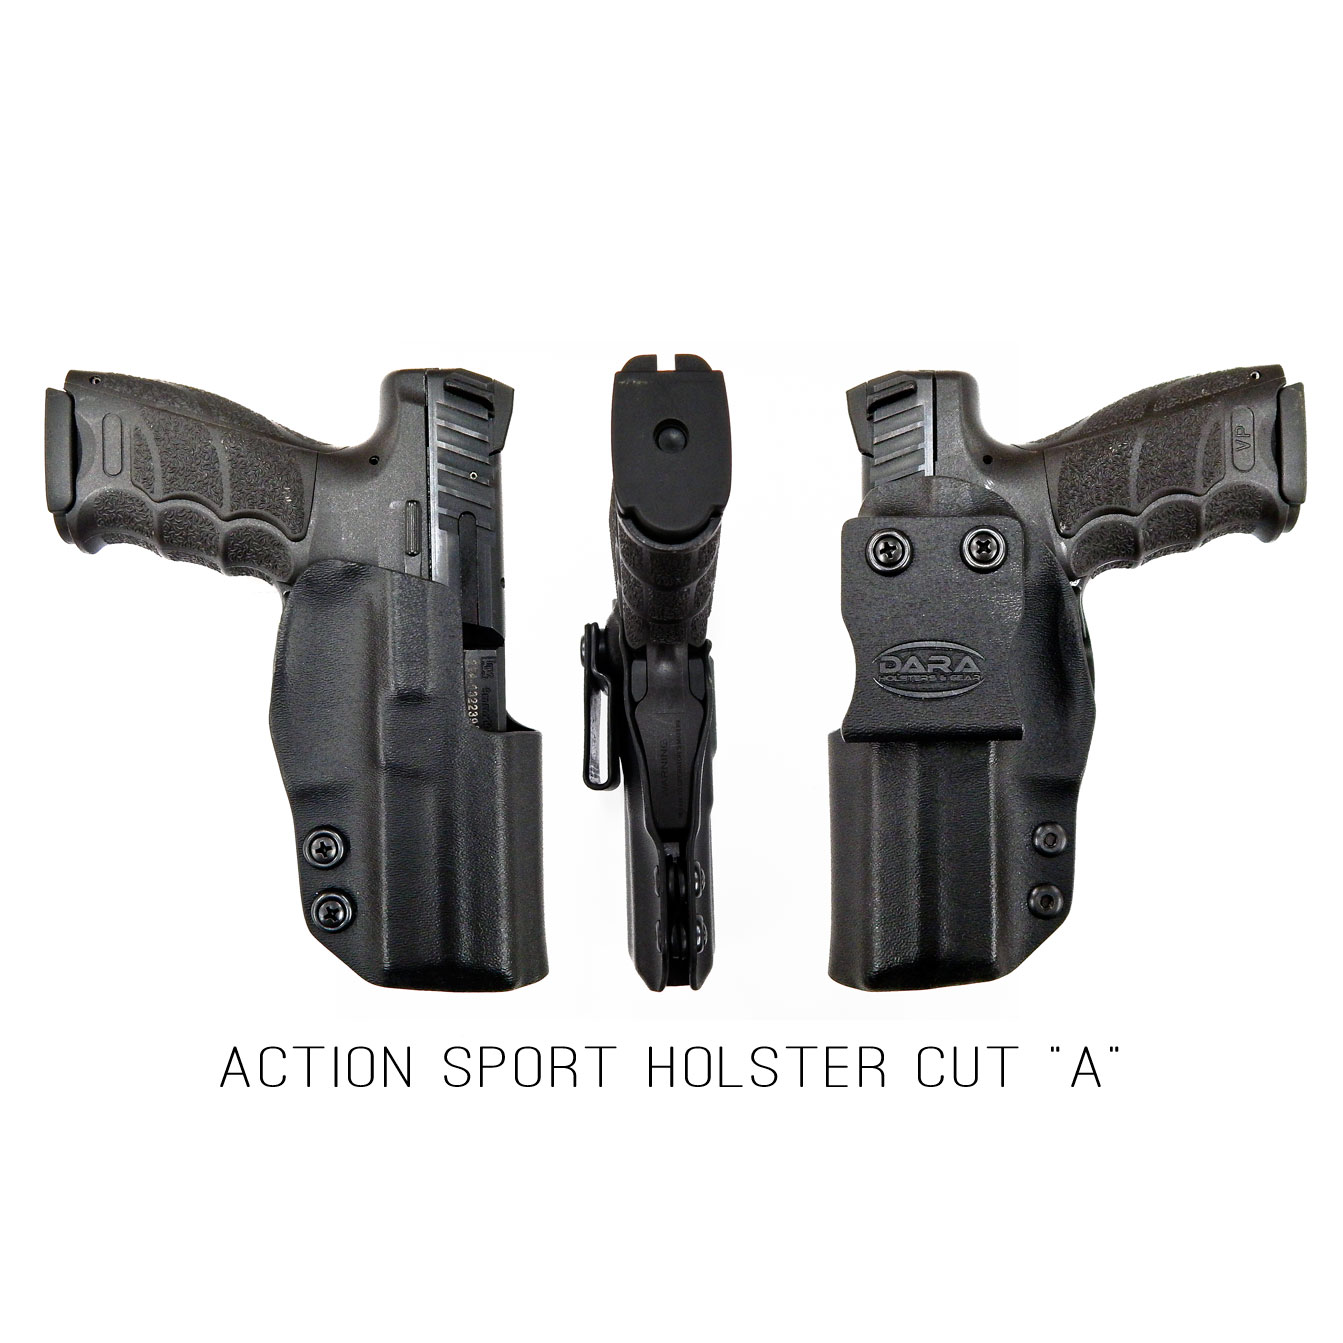 tri-fold-action-sport-cut-a.jpg